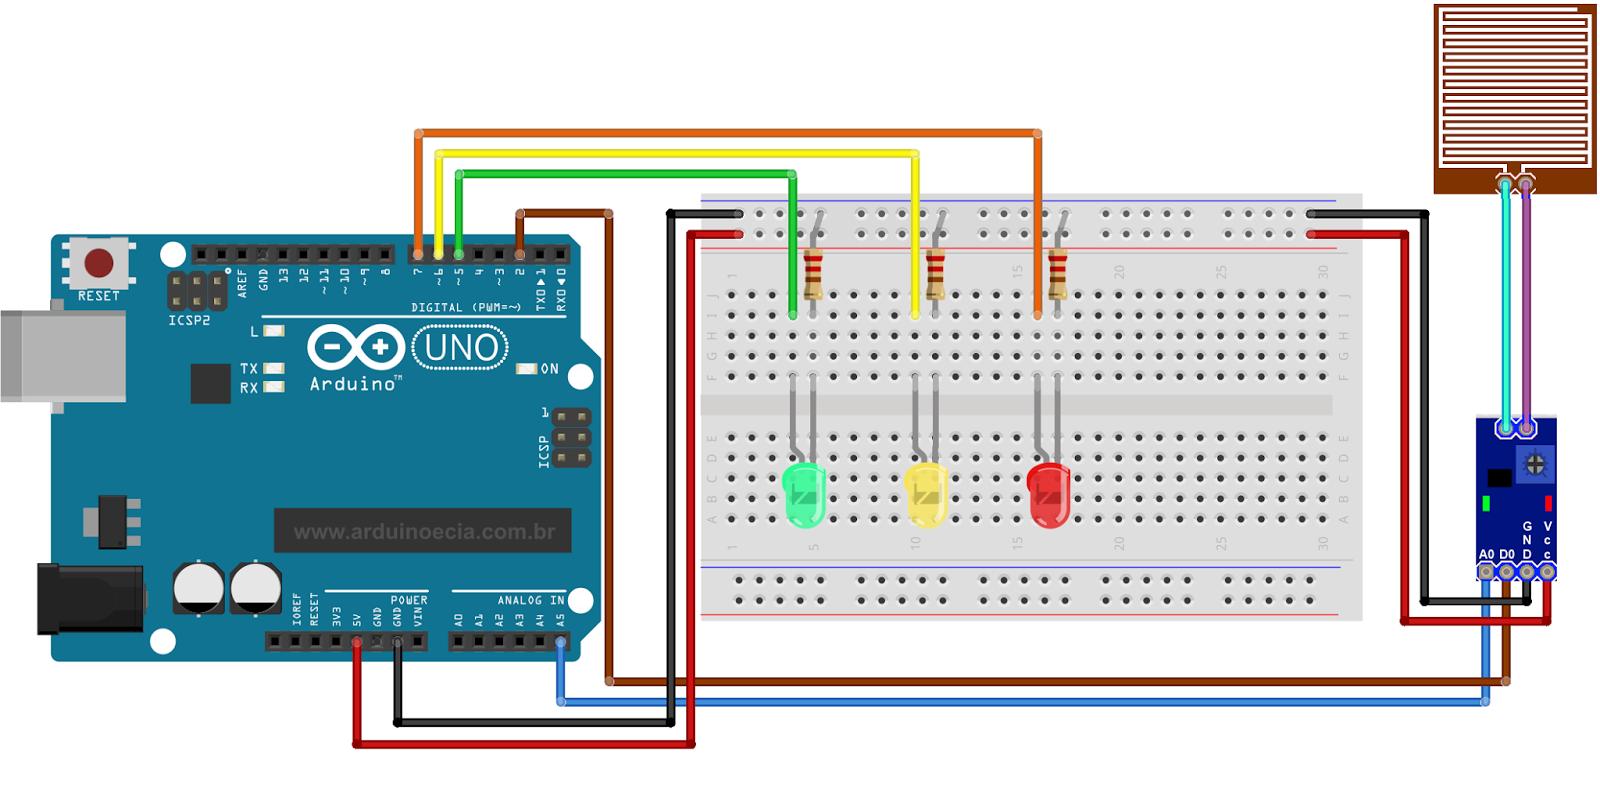 circuits4you.com: Interfacing a rain sensor to the Arduino